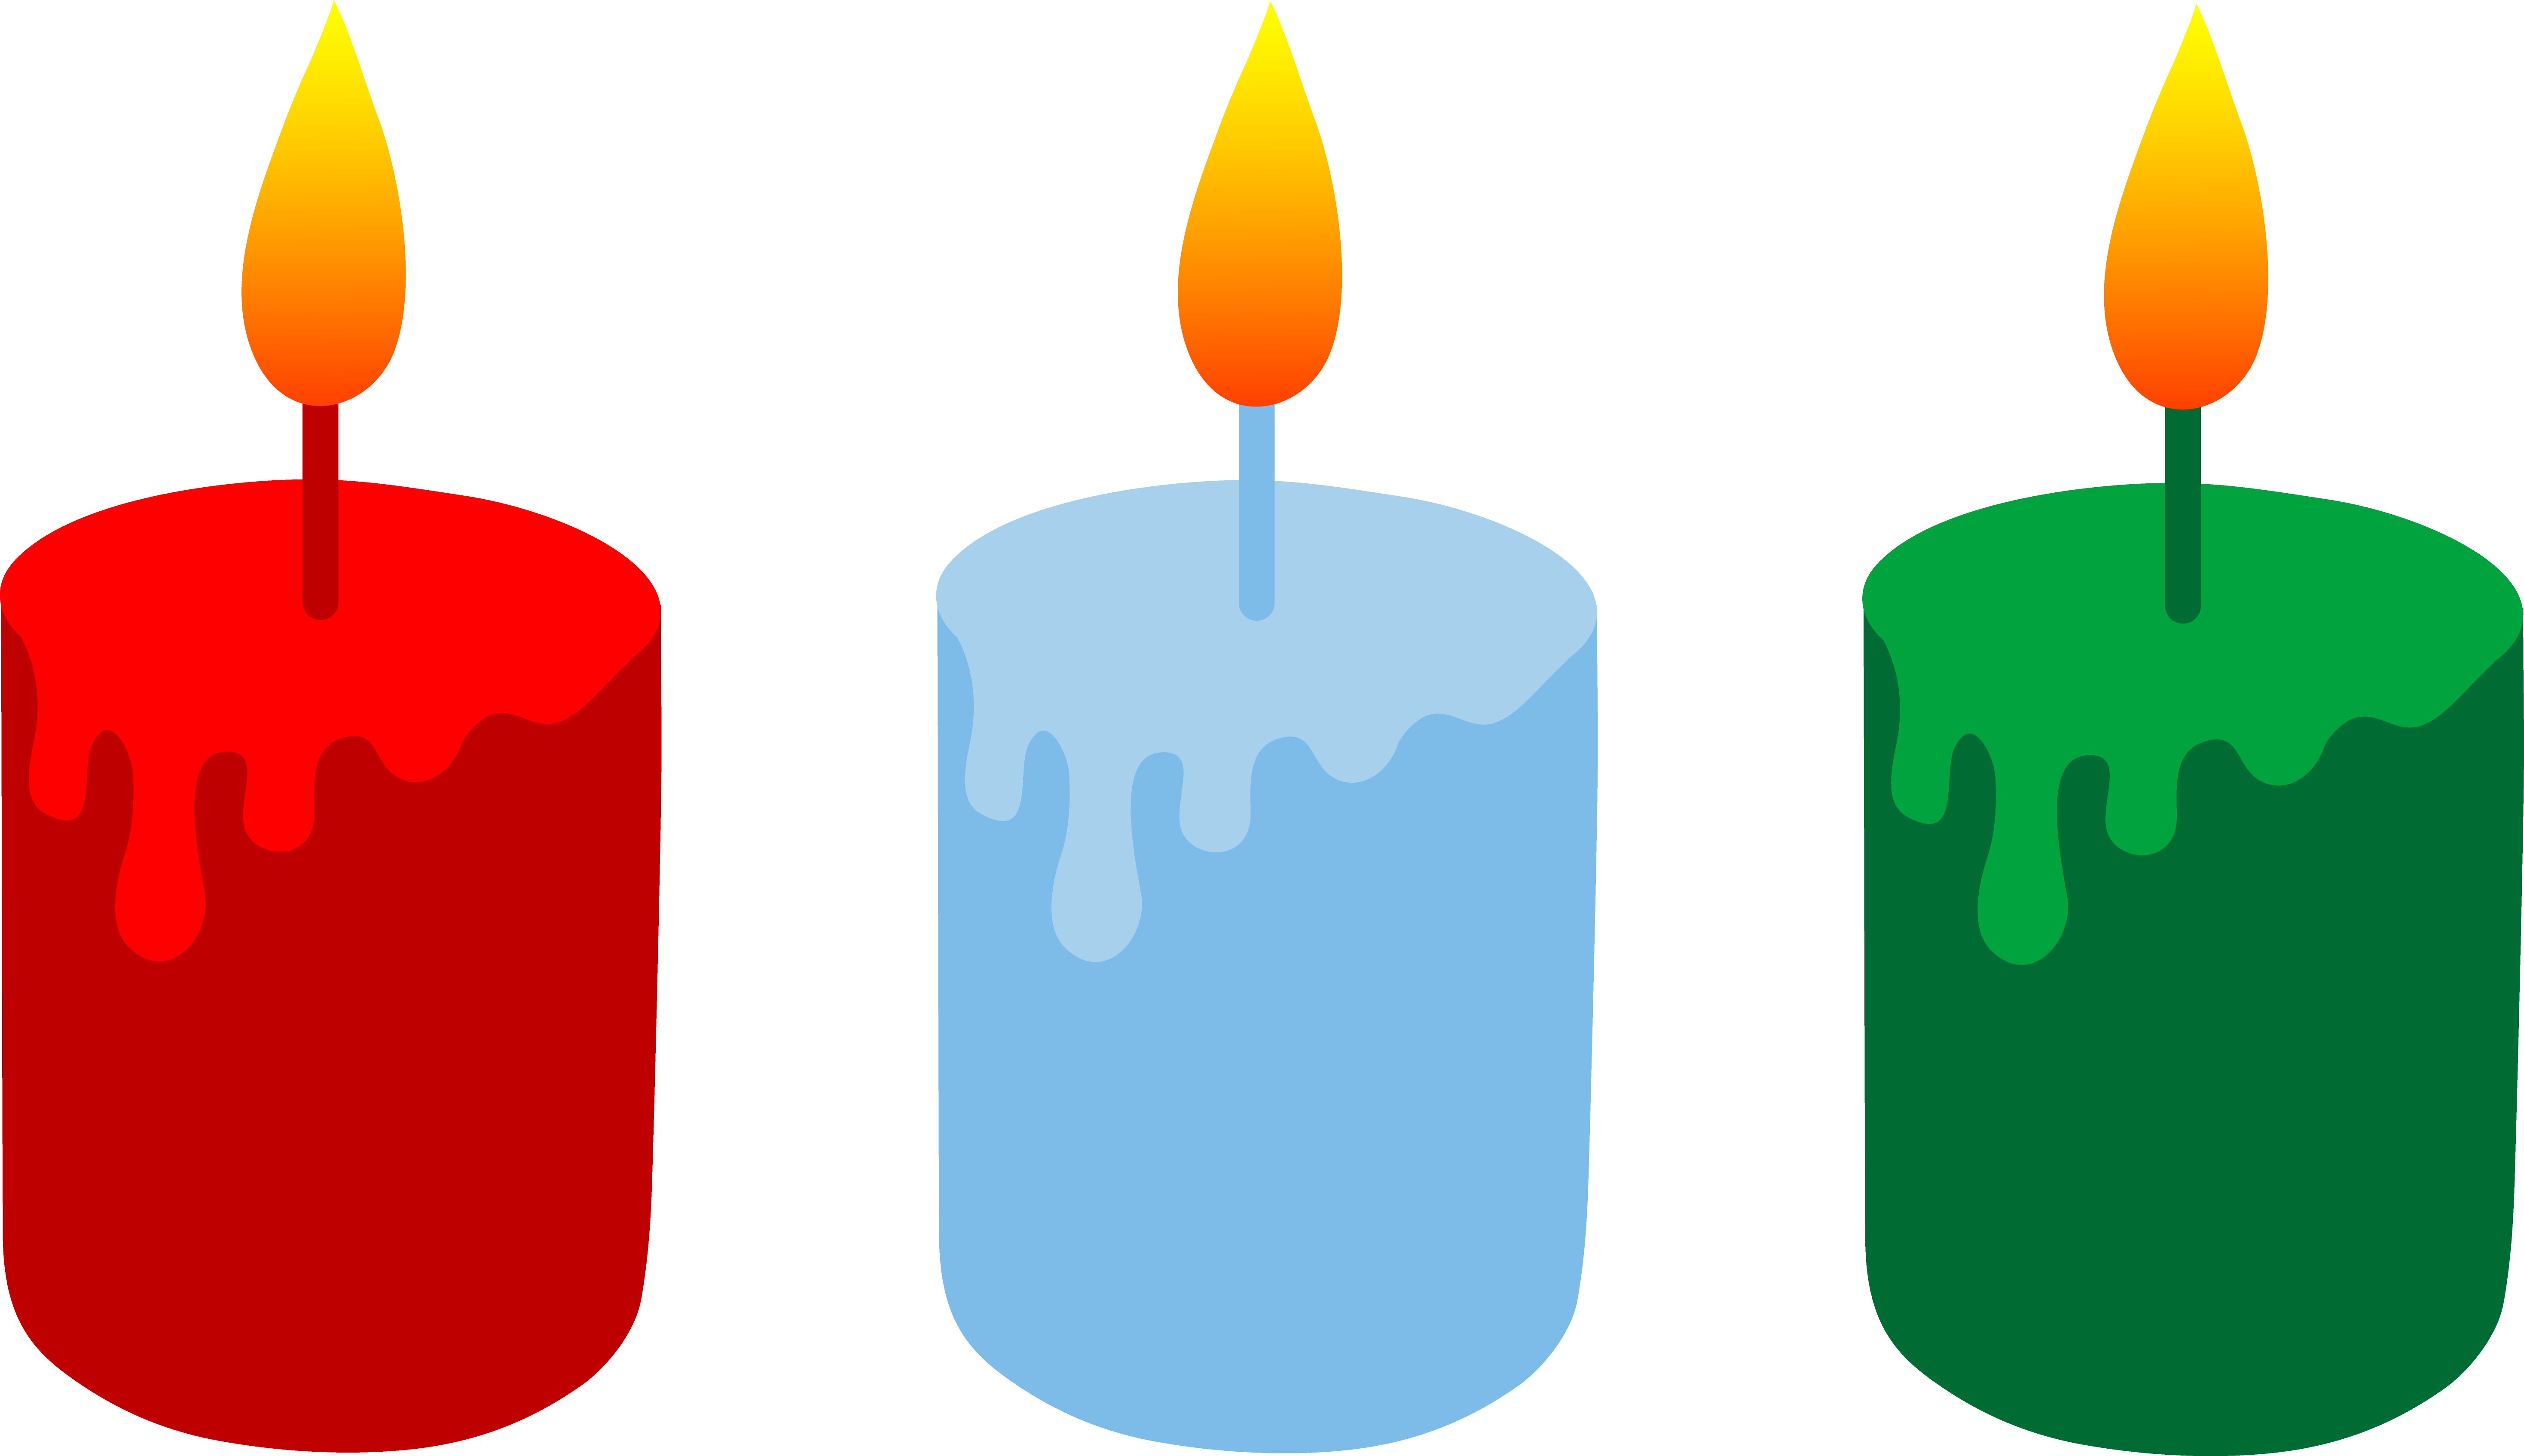 5874x3389 Three Christmas Holiday Candles